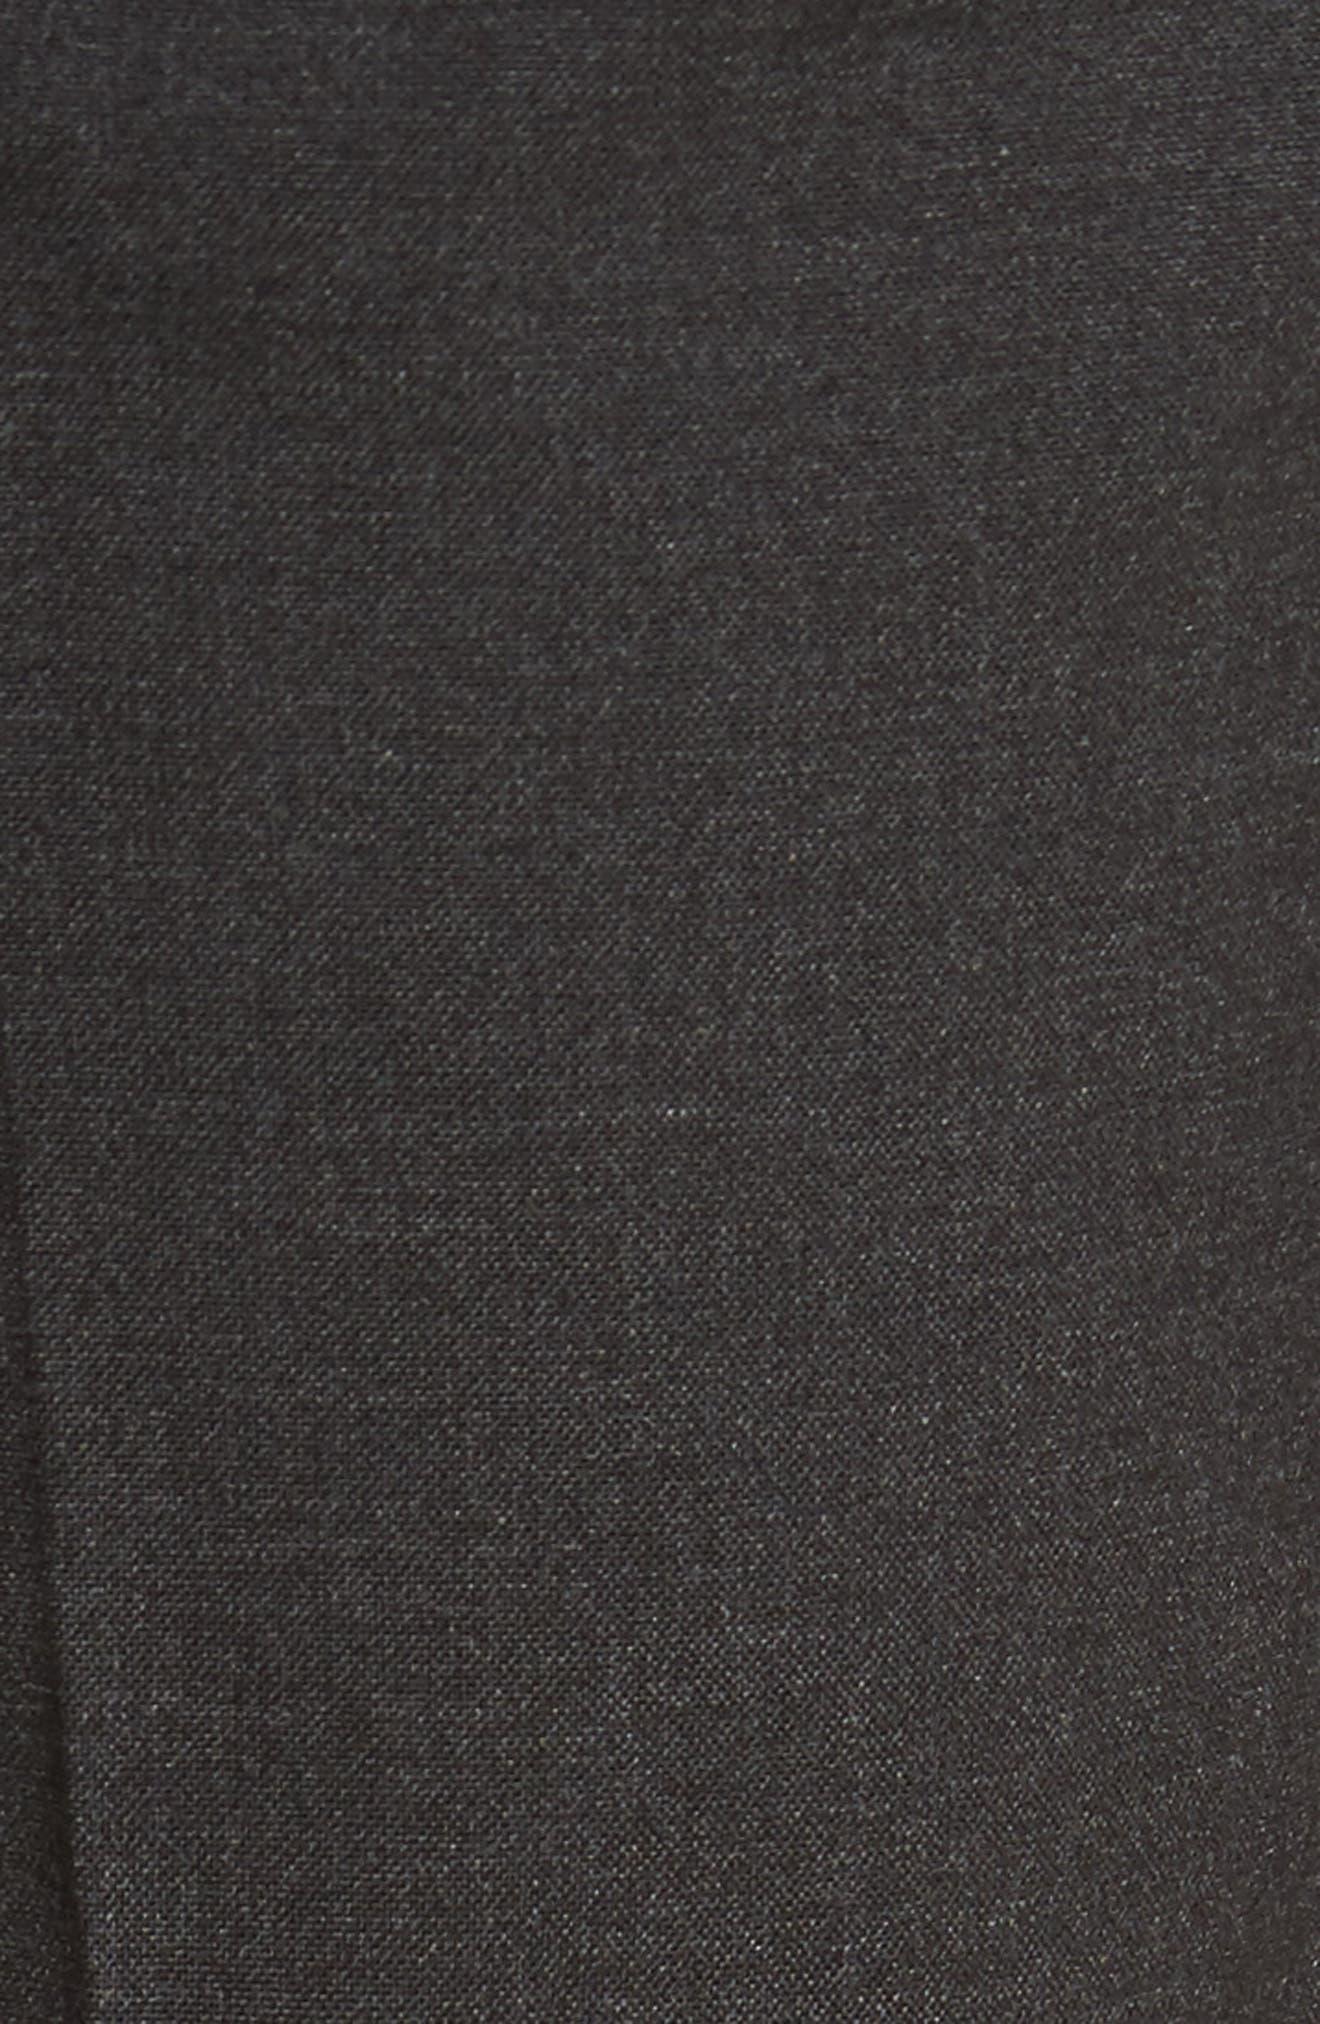 Black Skinny Fit Trousers,                             Alternate thumbnail 10, color,